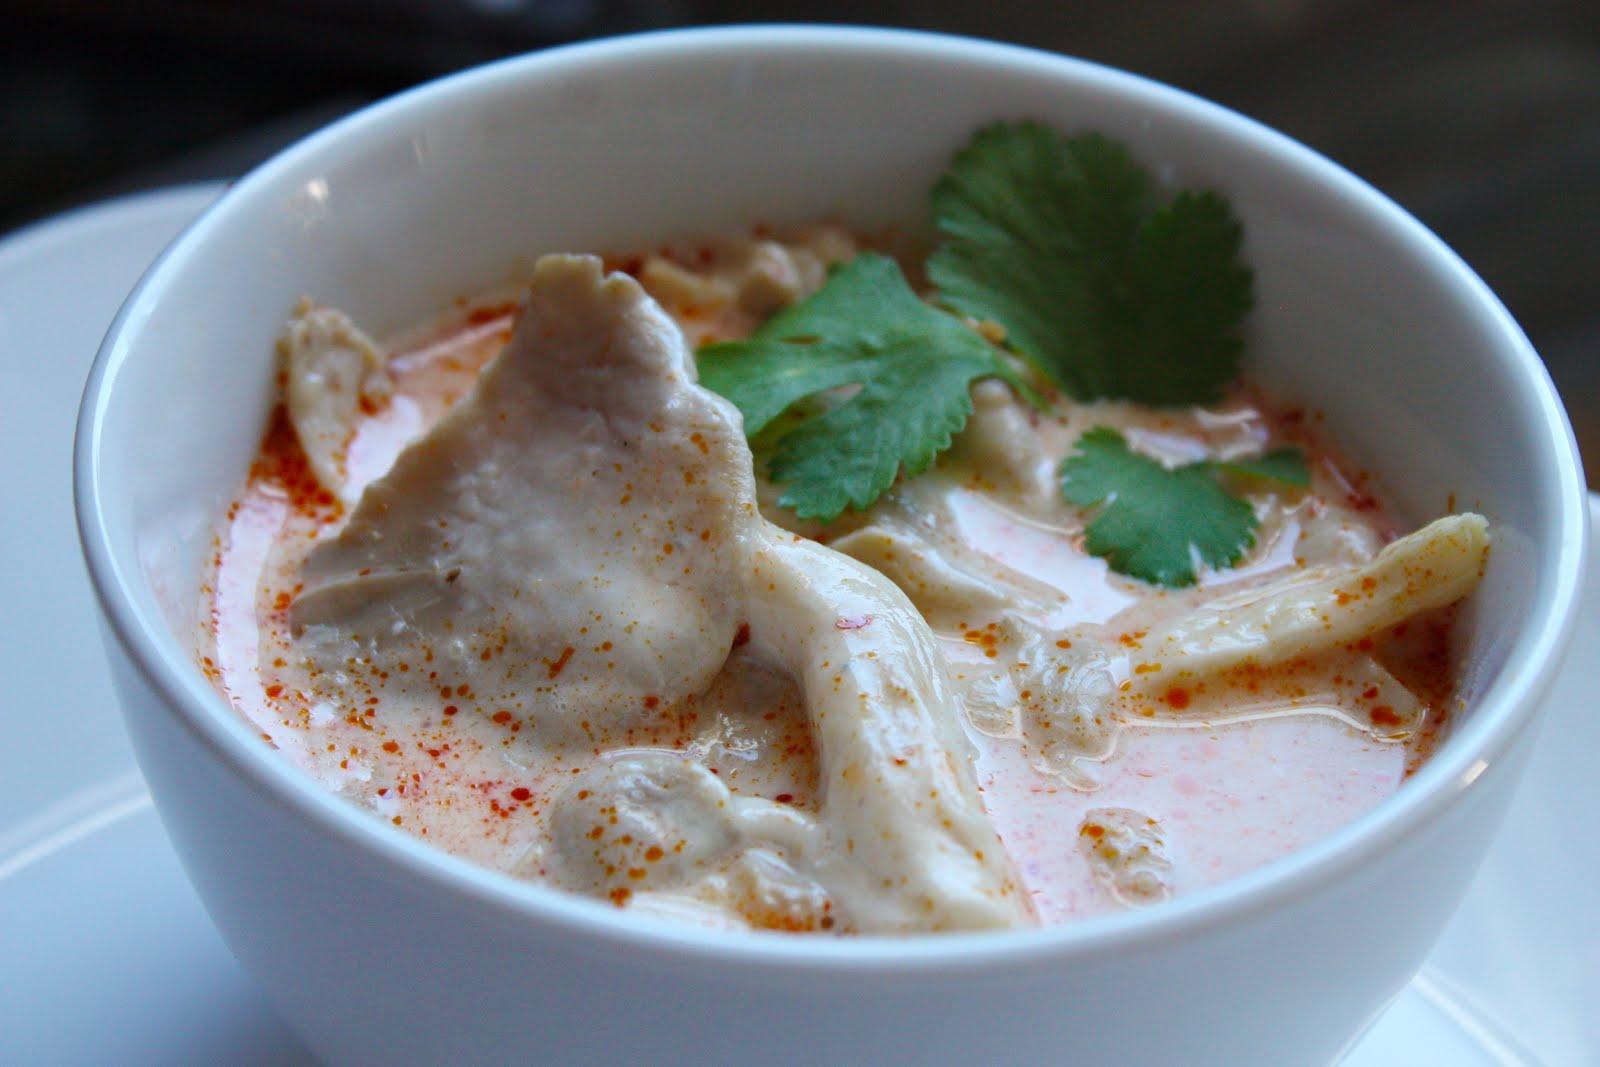 Tom Kha Udon Soup With Mushrooms Recipes — Dishmaps